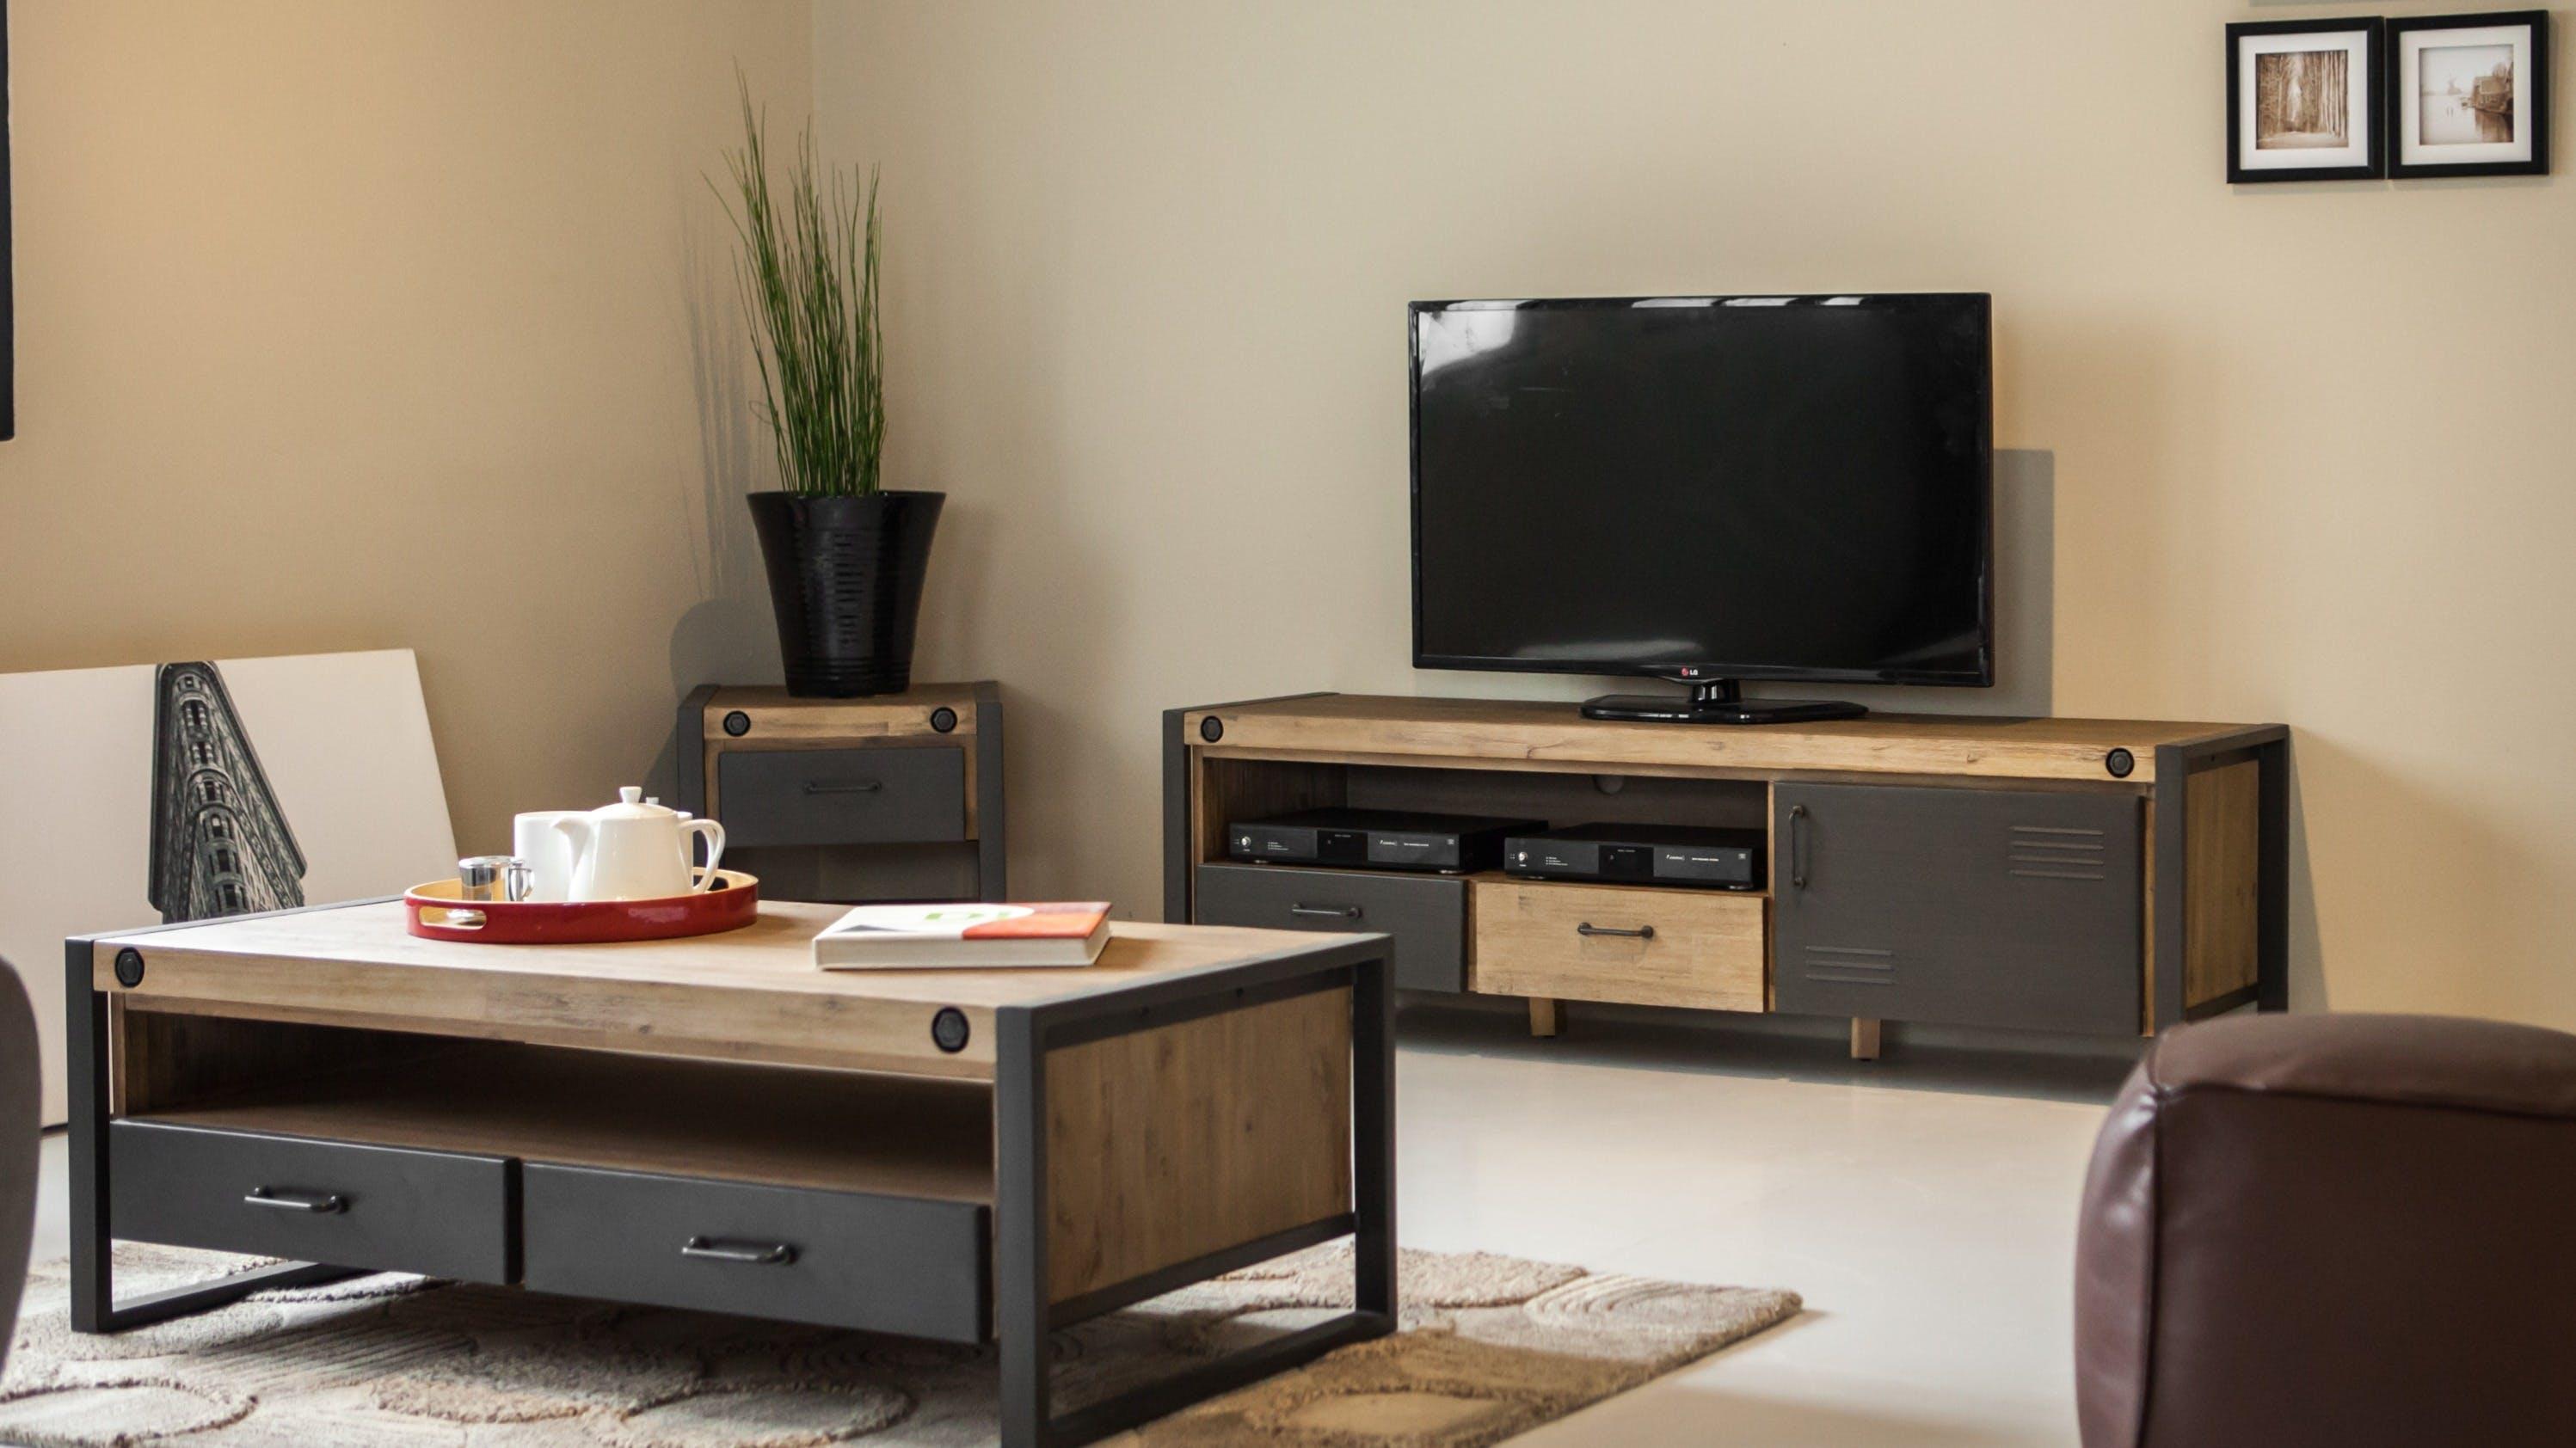 Meubles TV en bois recyclé : en teck recyclé, en hévéa recyclé...